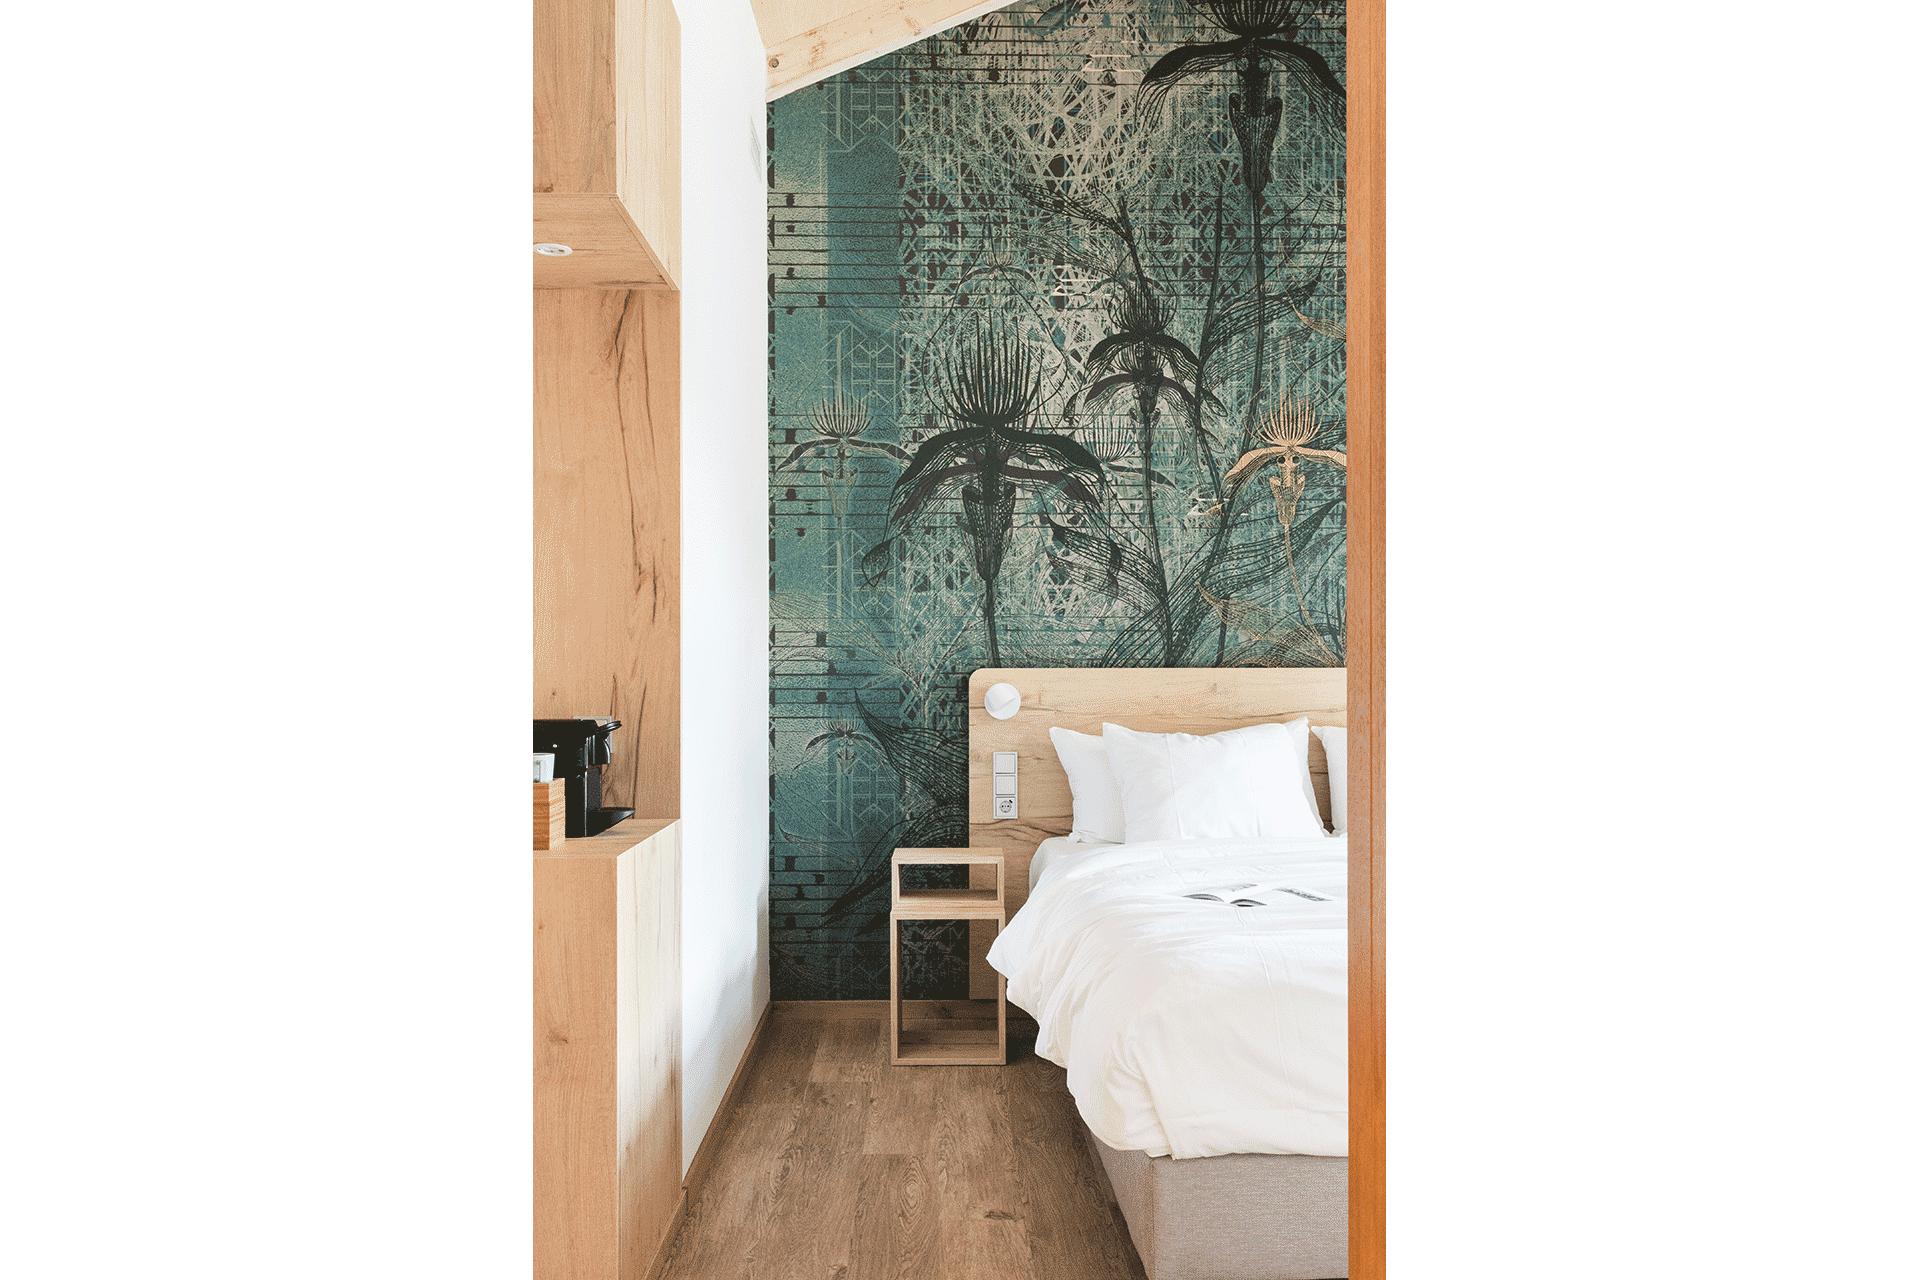 architect zoetmulder hotelkamer bed nachtkastje hout duurzaam patroon groen